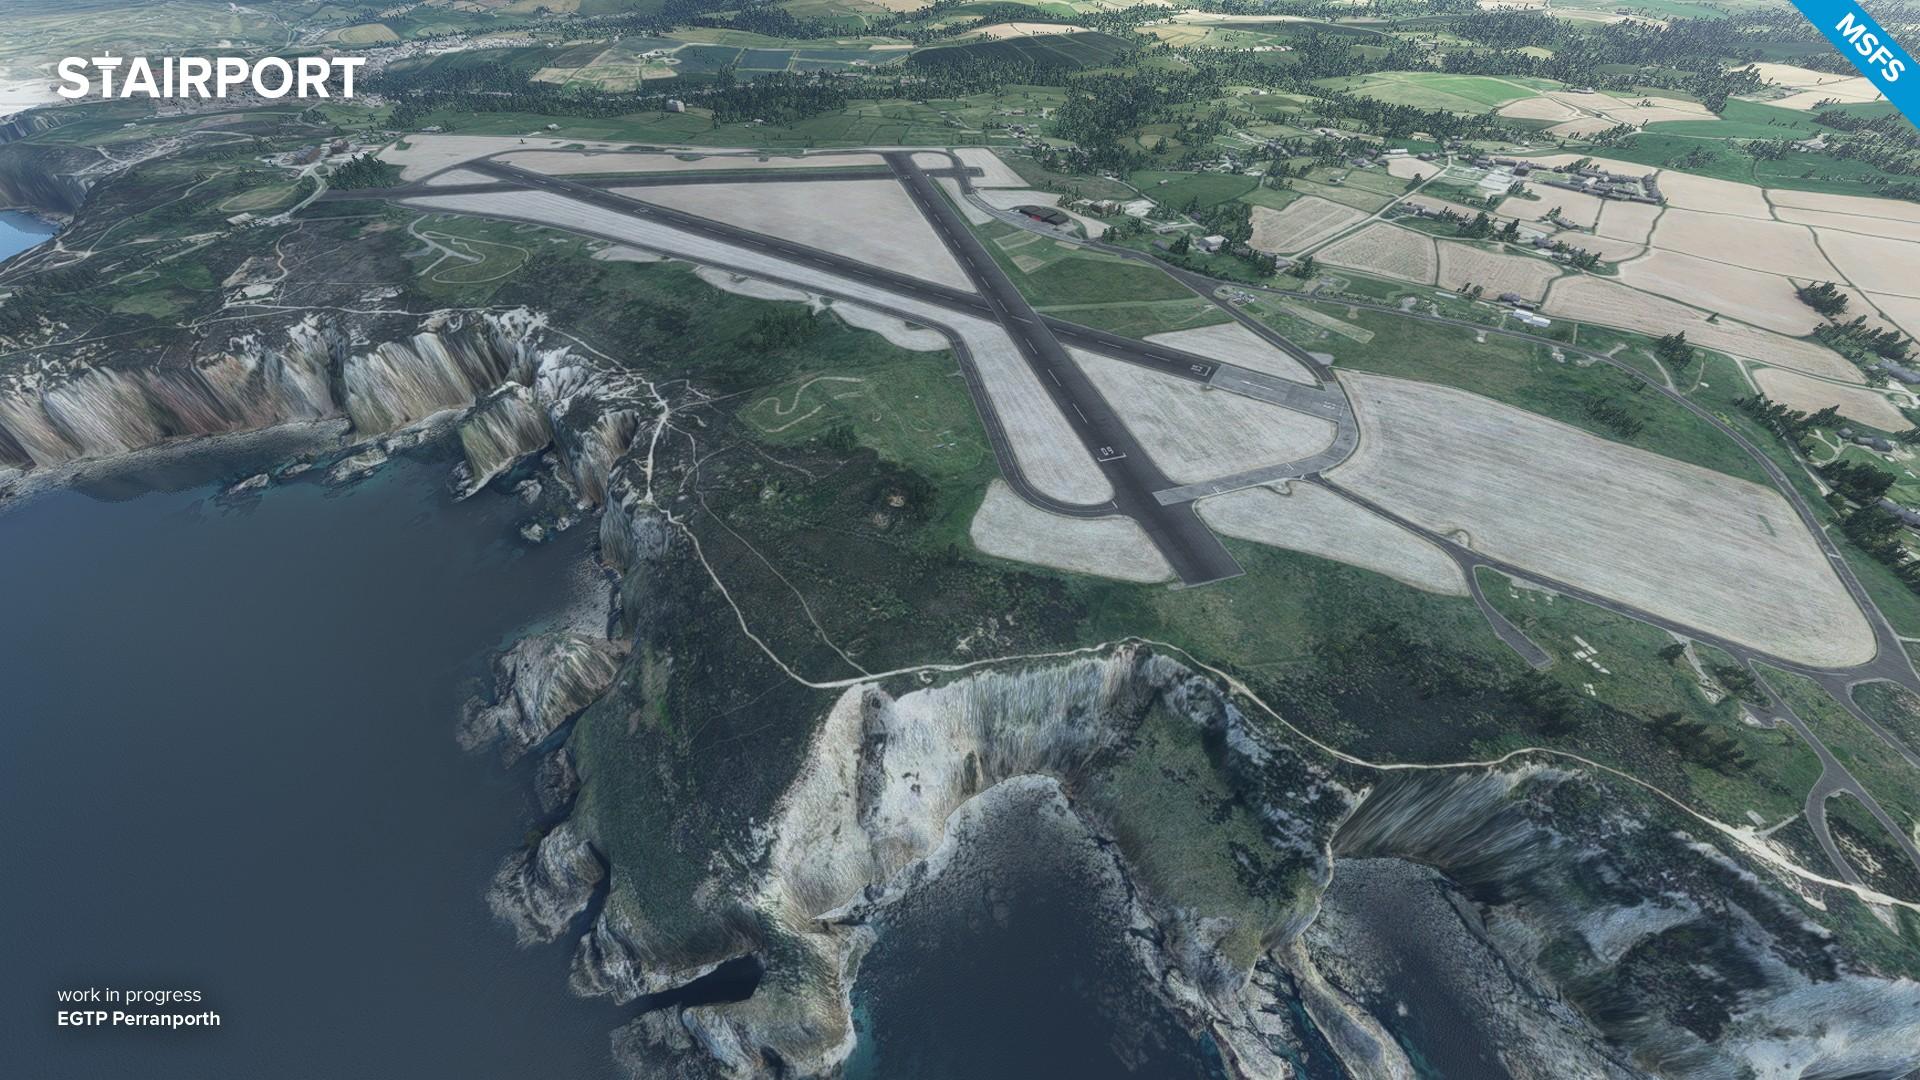 Aerosoft Announces Airfield Perranporth for MSFS